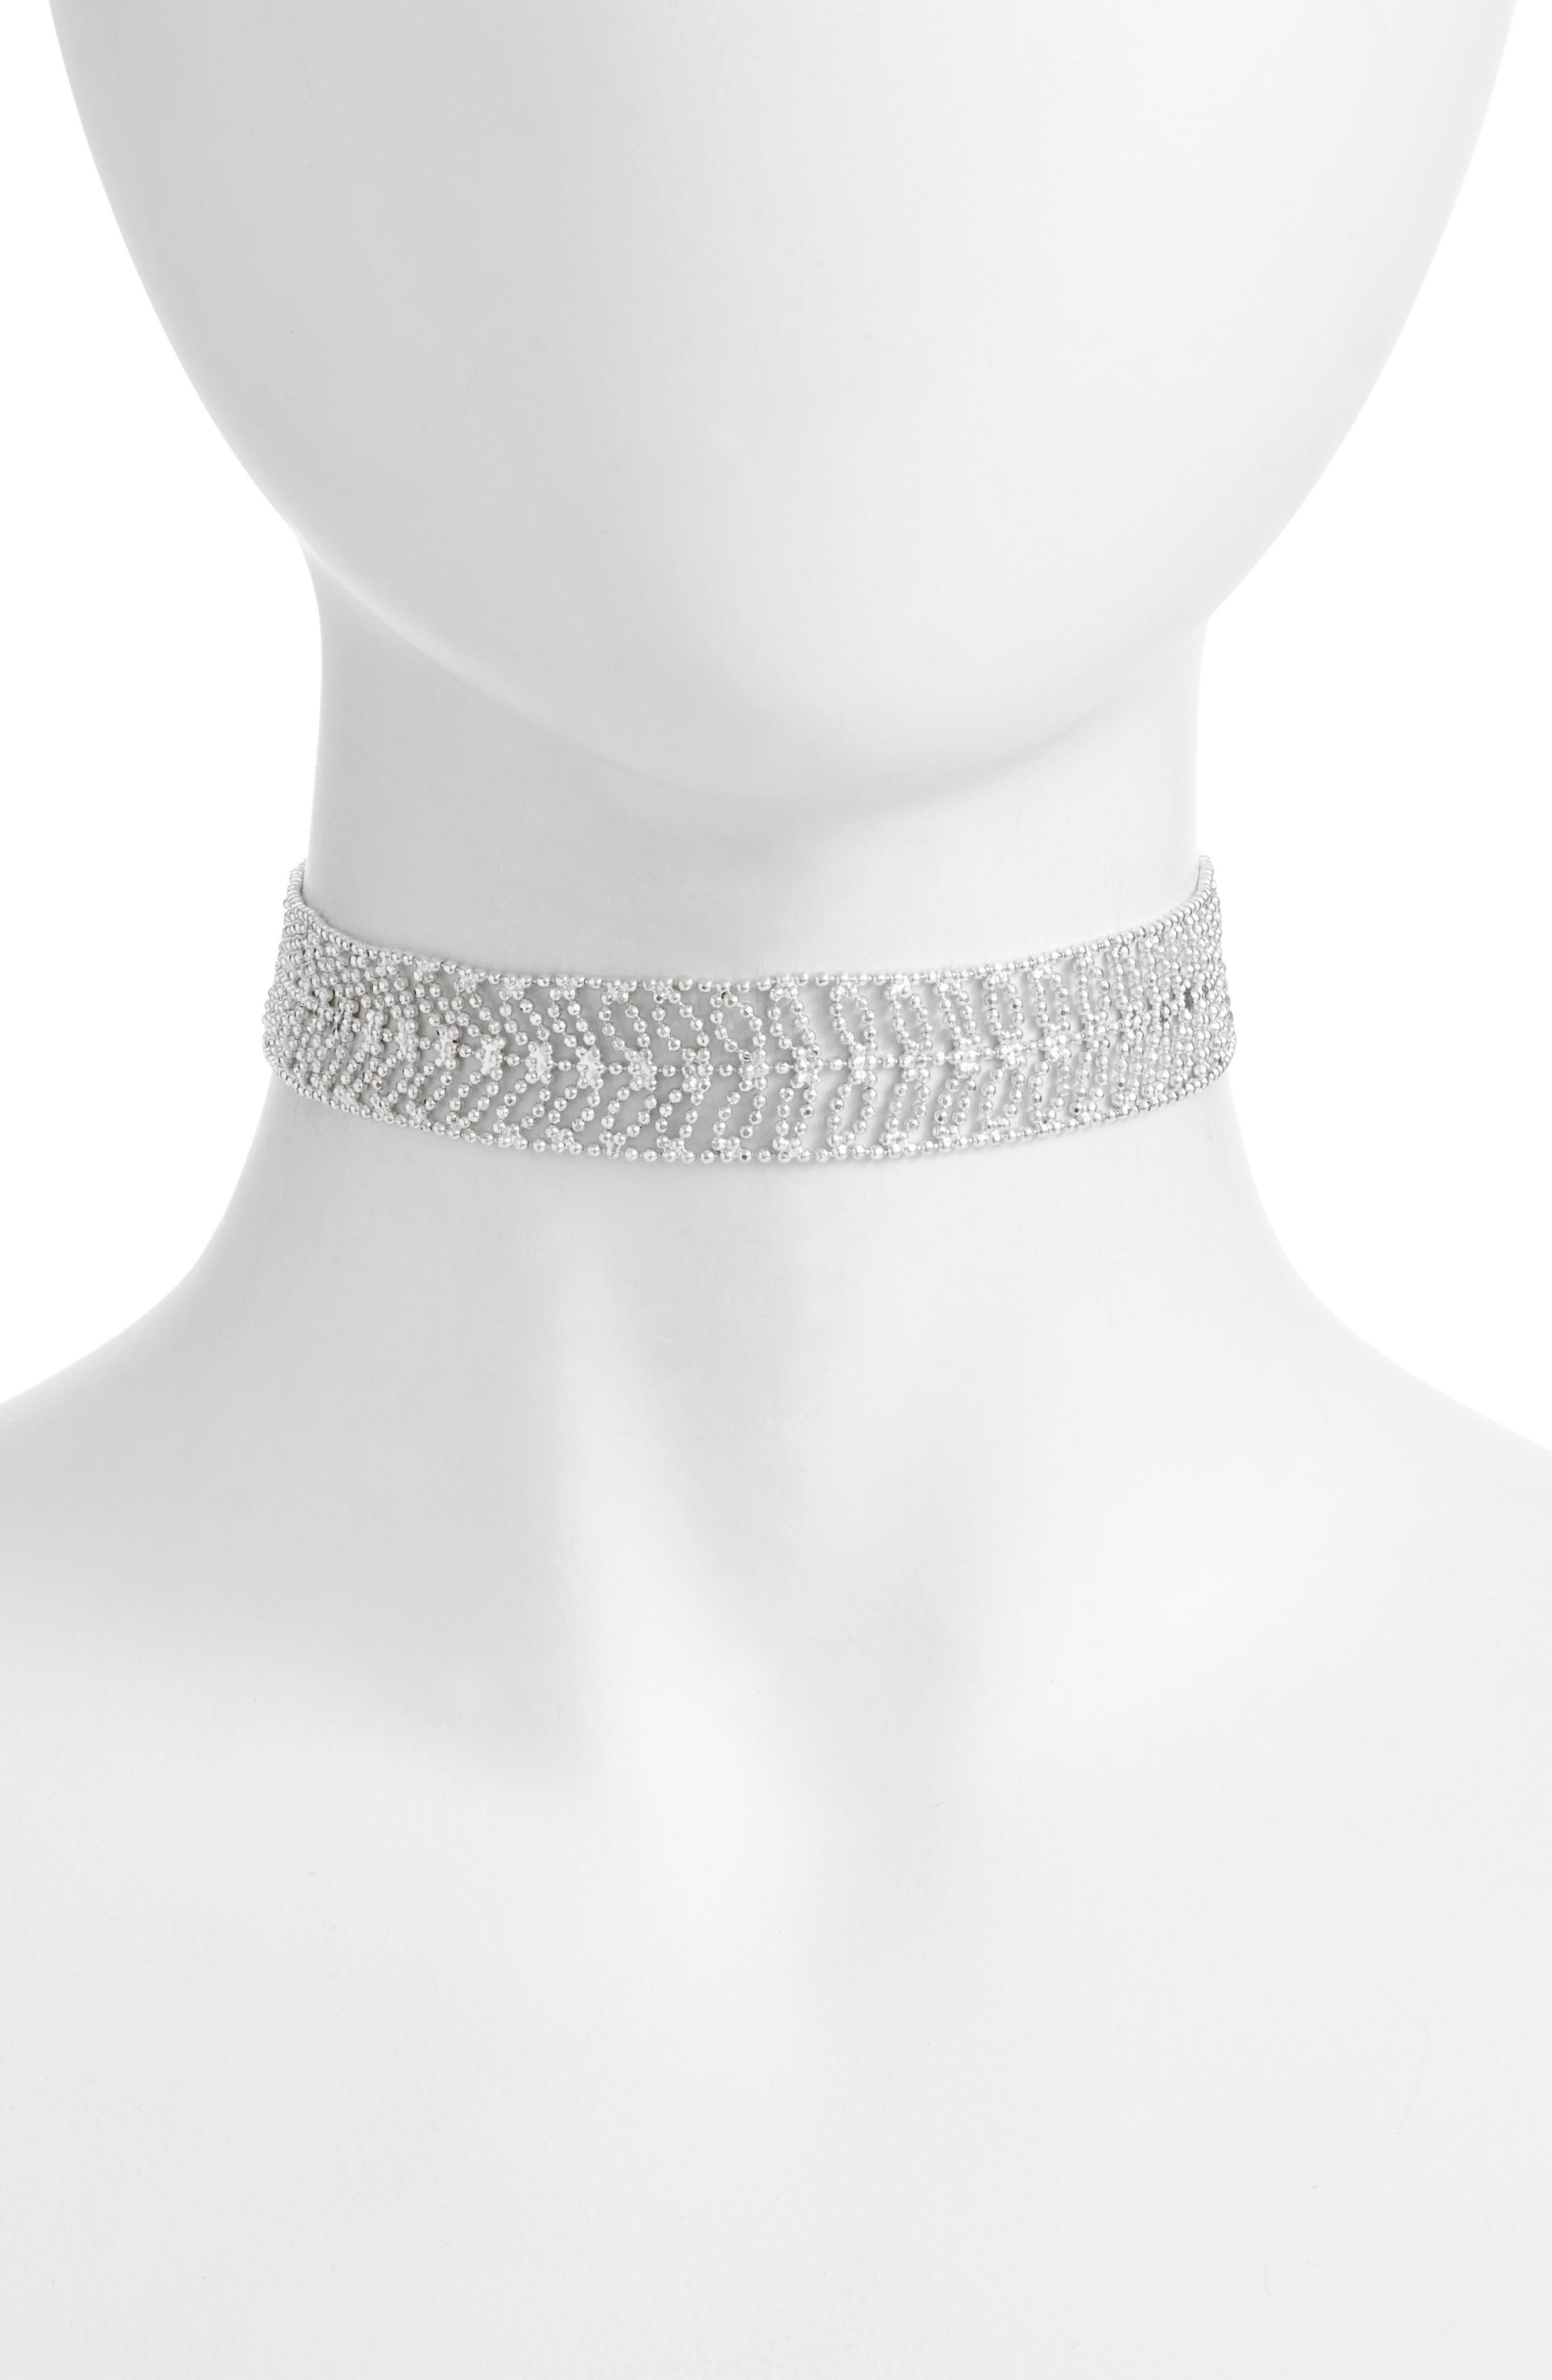 Main Image - Danielle Nicole Elm Choker Necklace